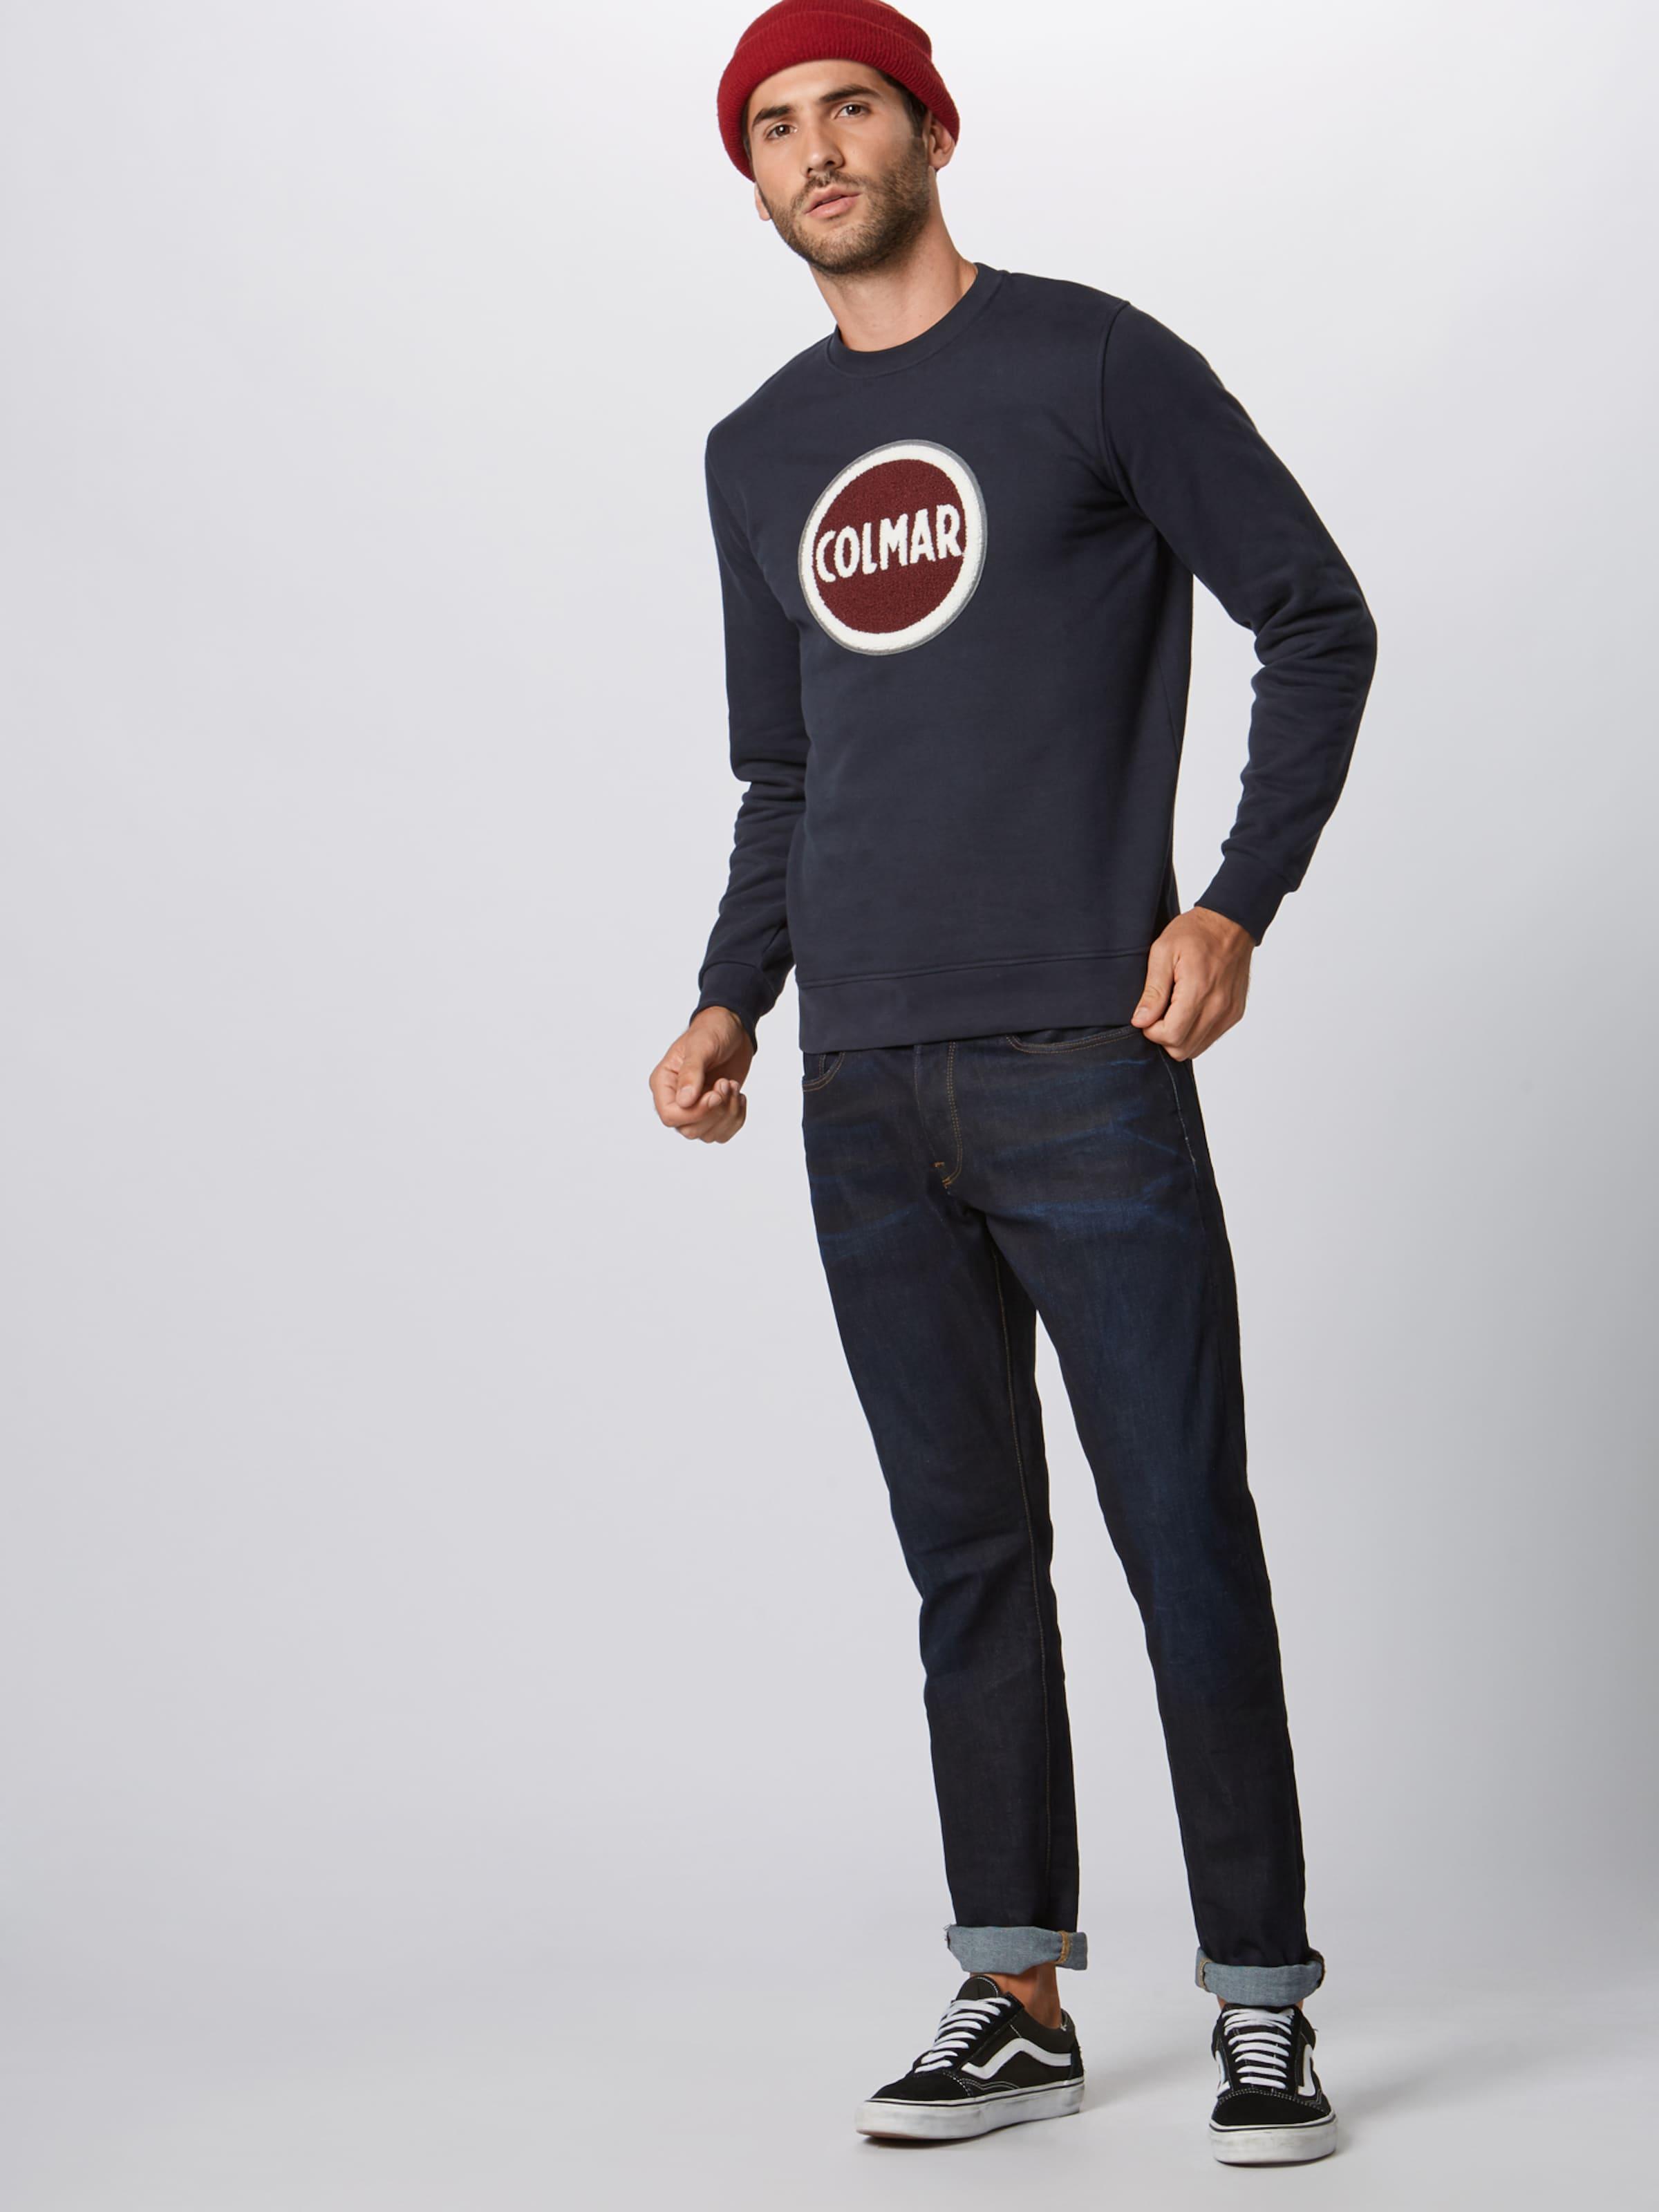 shirt Colmar Bleu En Marine Sweat 'sounds' If6vbyY7gm